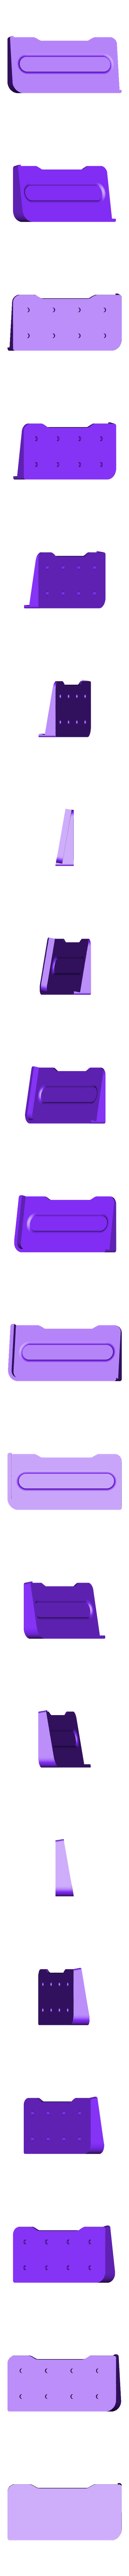 Nexus_5X_Magnetic_Mount_v1-0.stl Download free STL file Phone Magnetic Mount • Design to 3D print, WalterHsiao